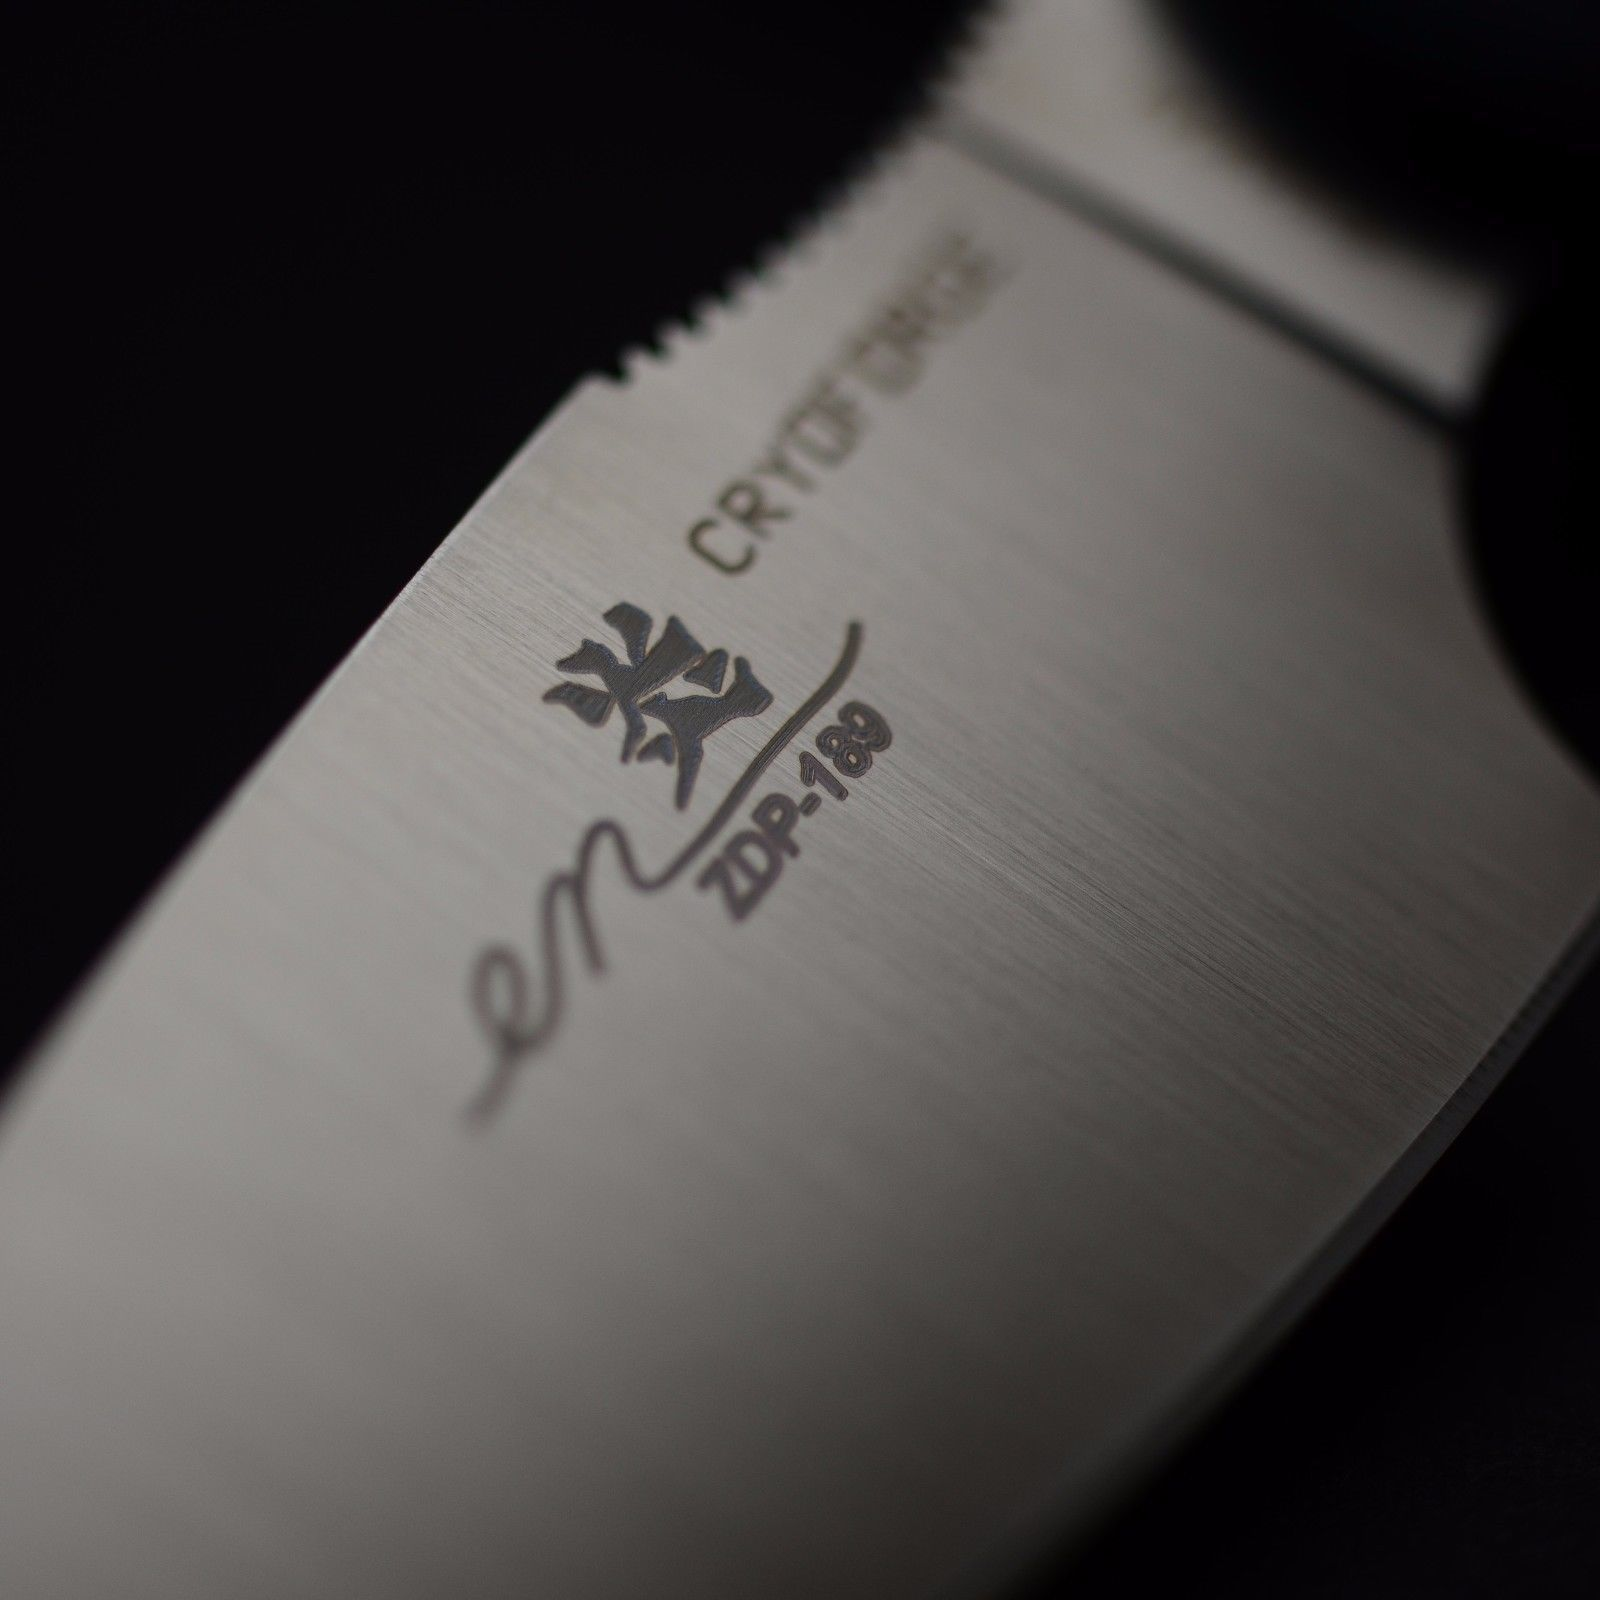 Фото 3 - Туристический нож G.Sakai, Camper En Fixed, ZDP-189, Black G-10